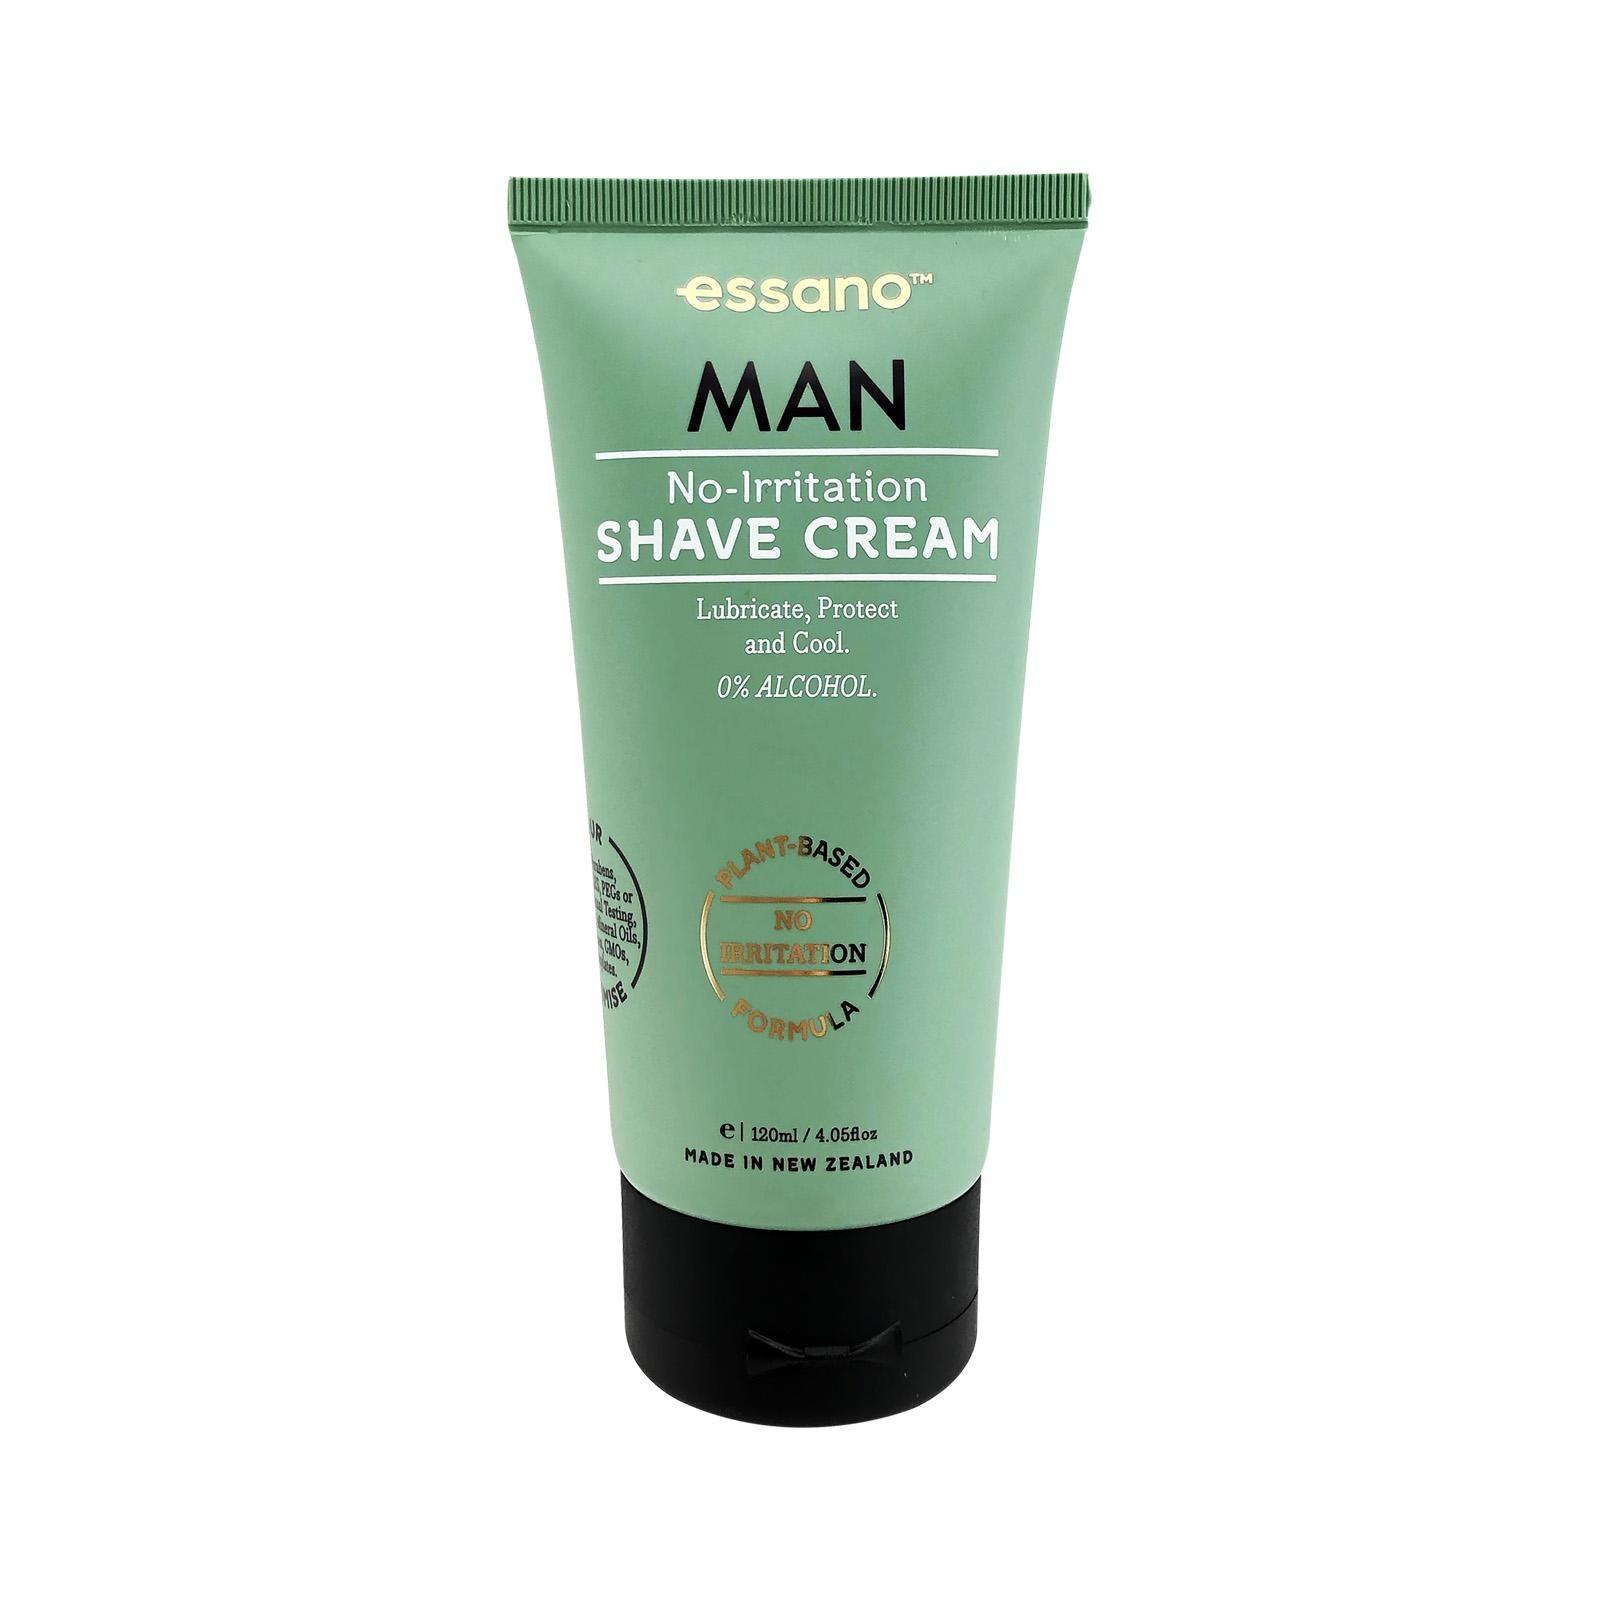 Essano Man No Irritation Shave Crme